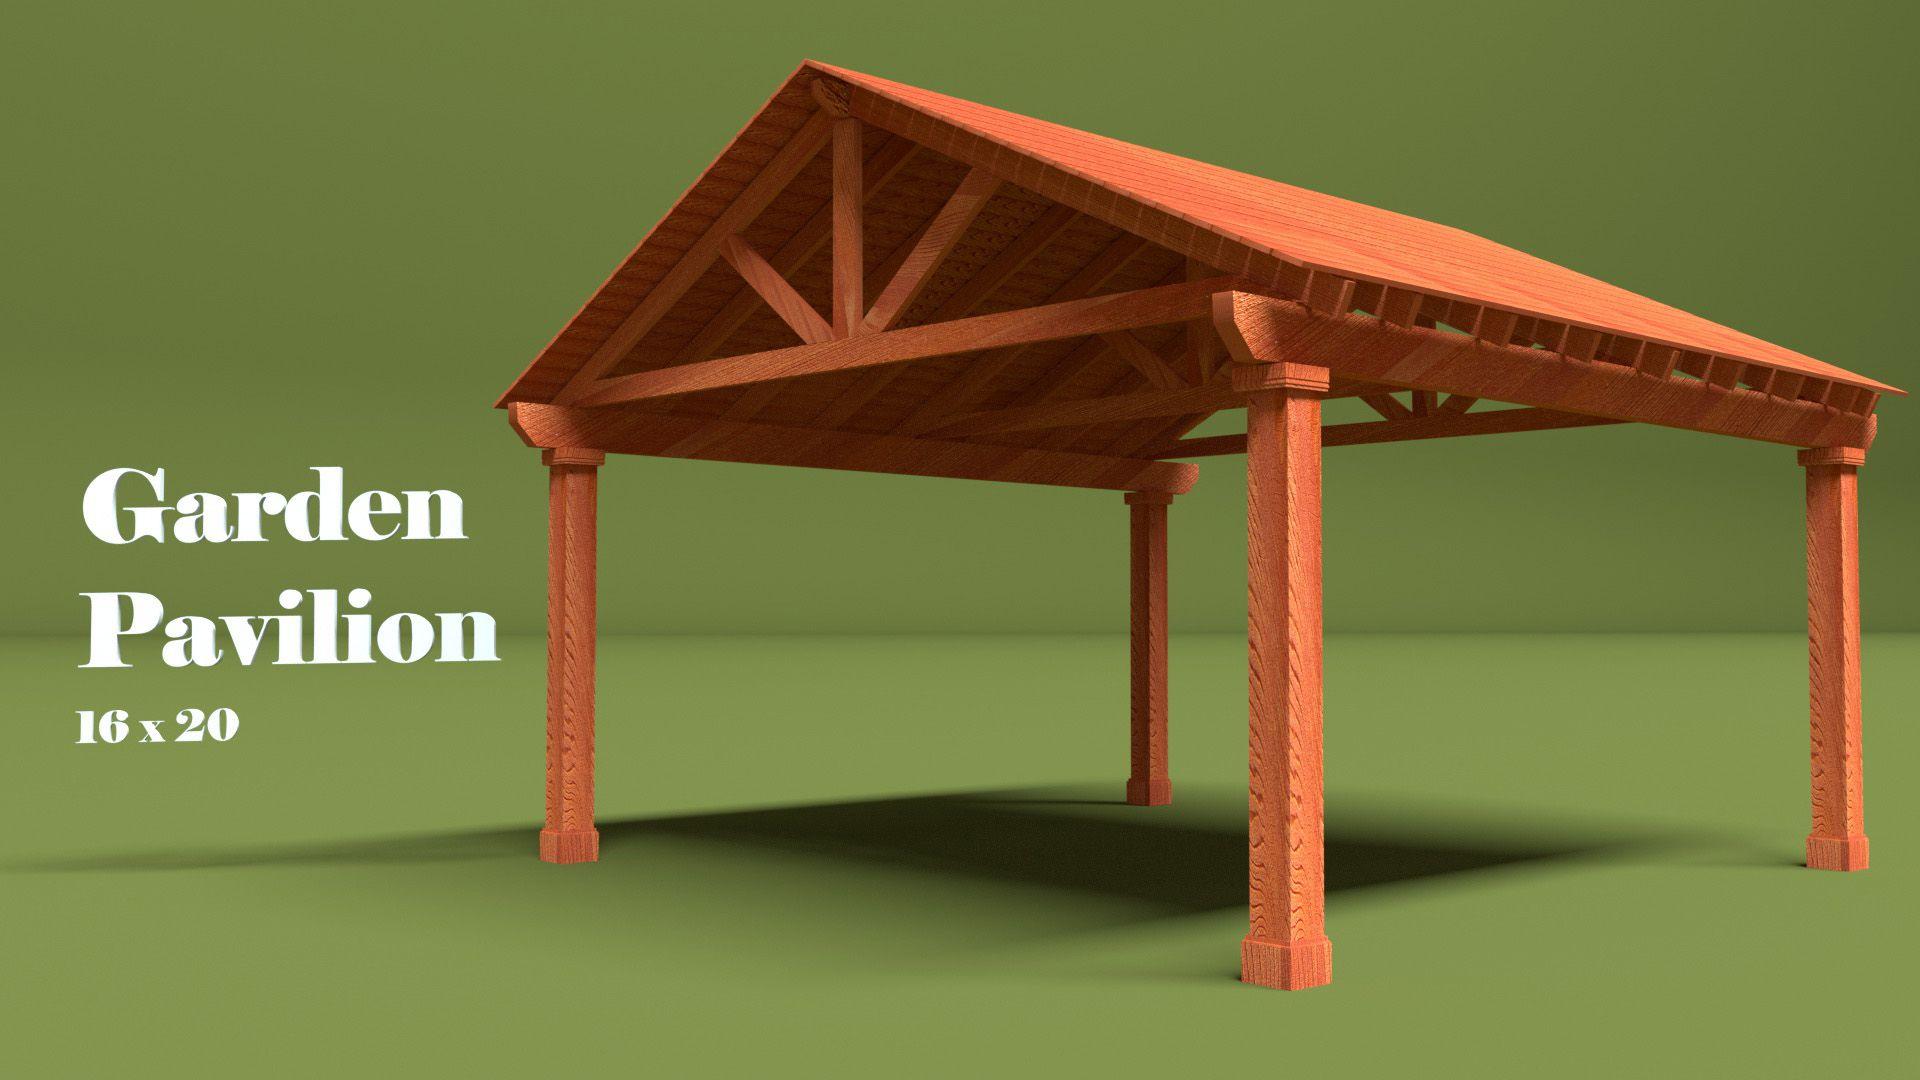 16×20 Western Red Cedar Pavilion in 2020 Pavilion